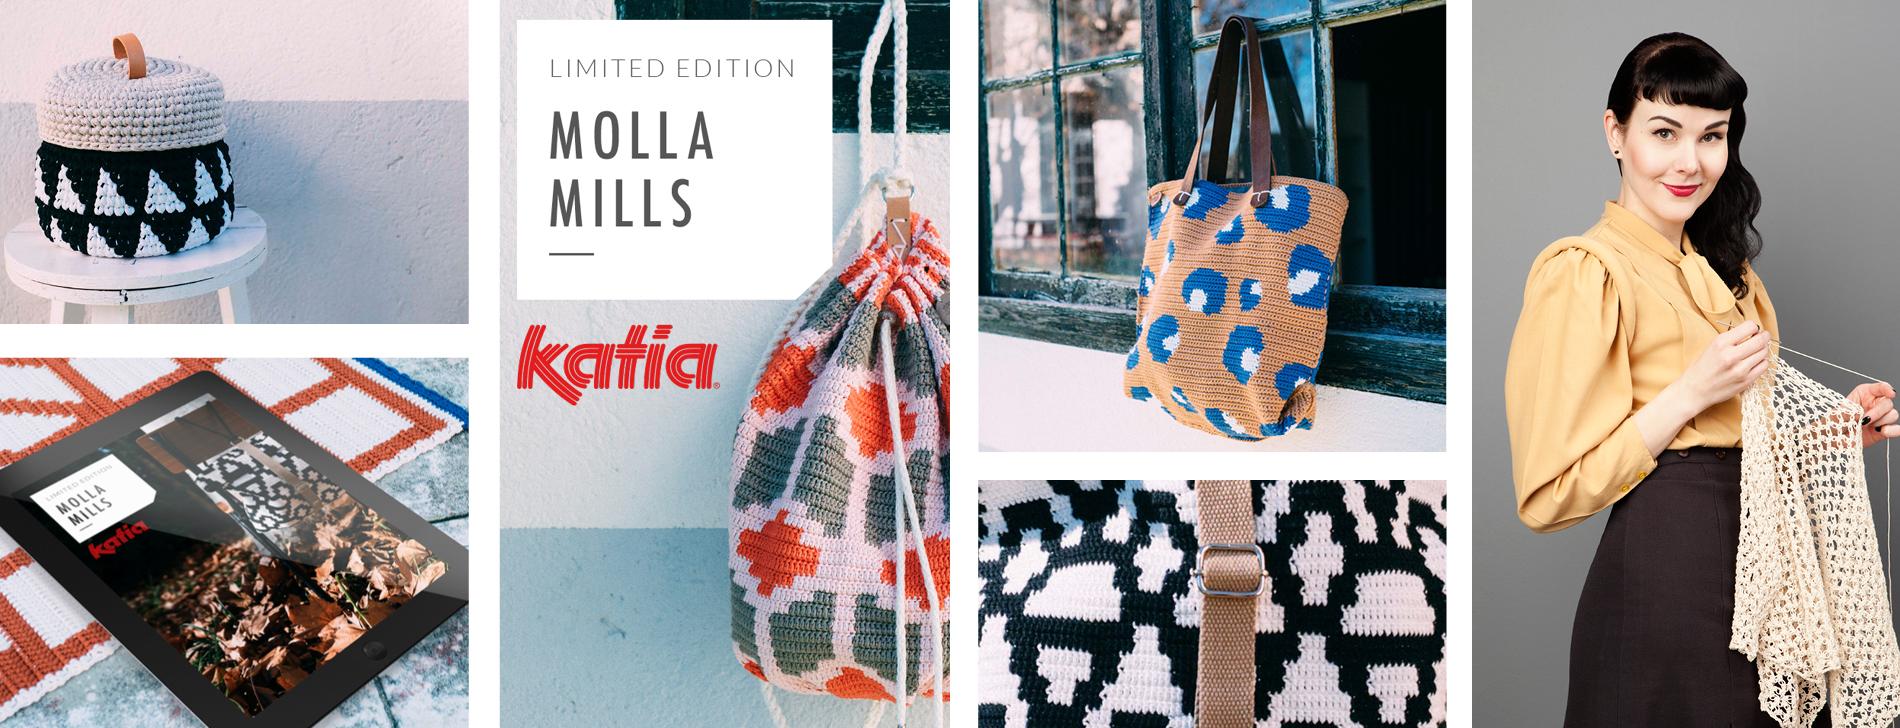 Molla Mills-Katia-exklusiv-limitied edition